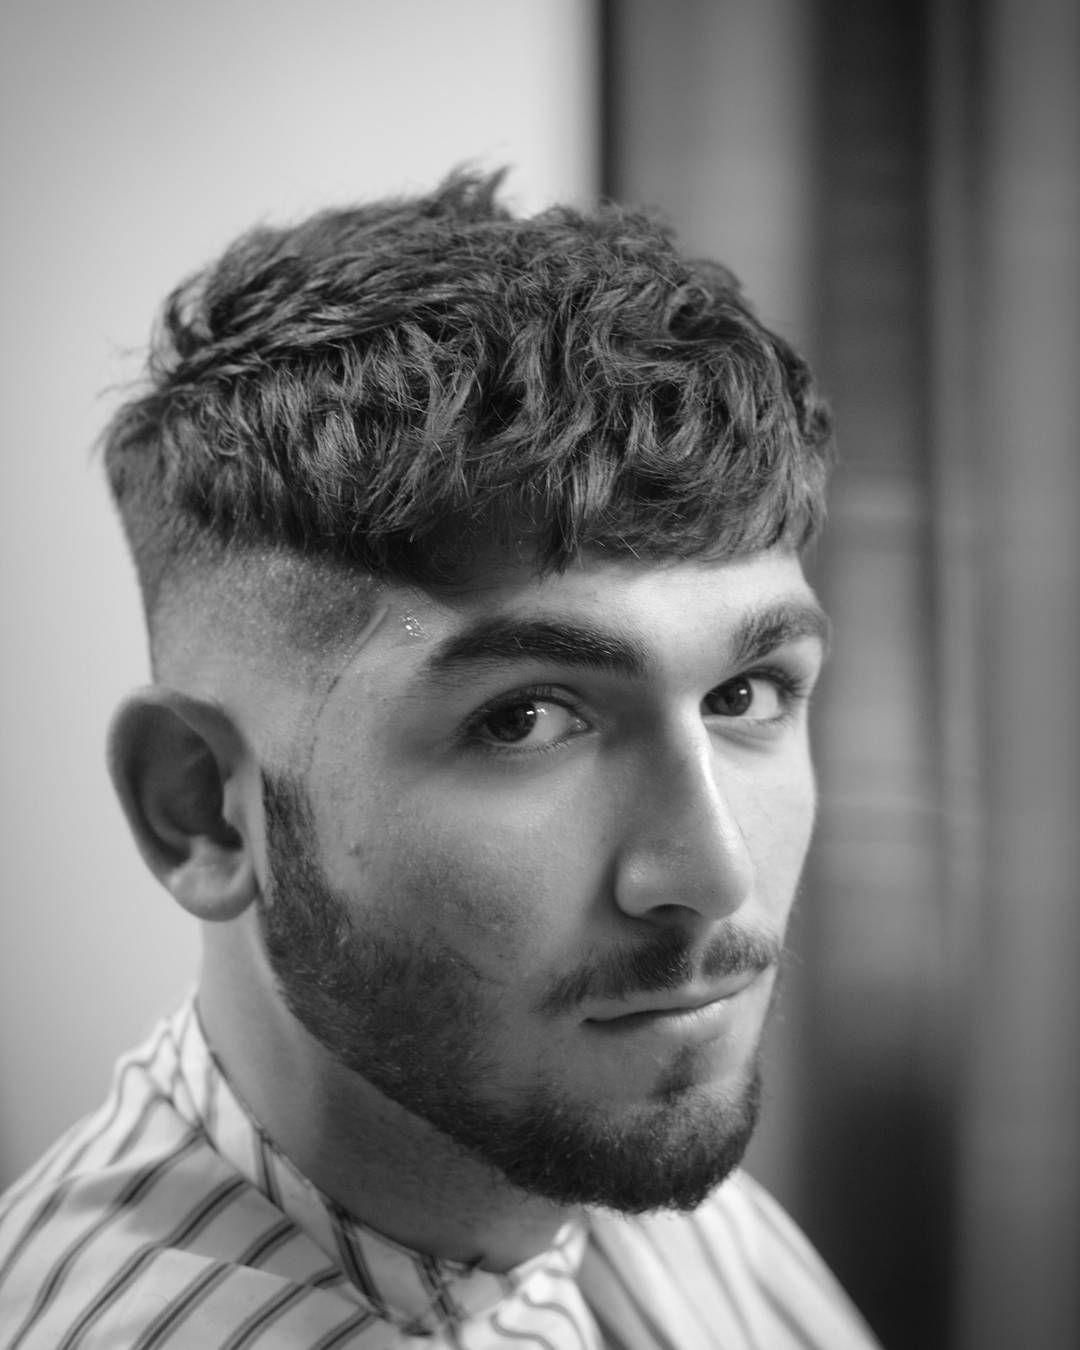 45 cool men's hairstyles 2017 | hair trends